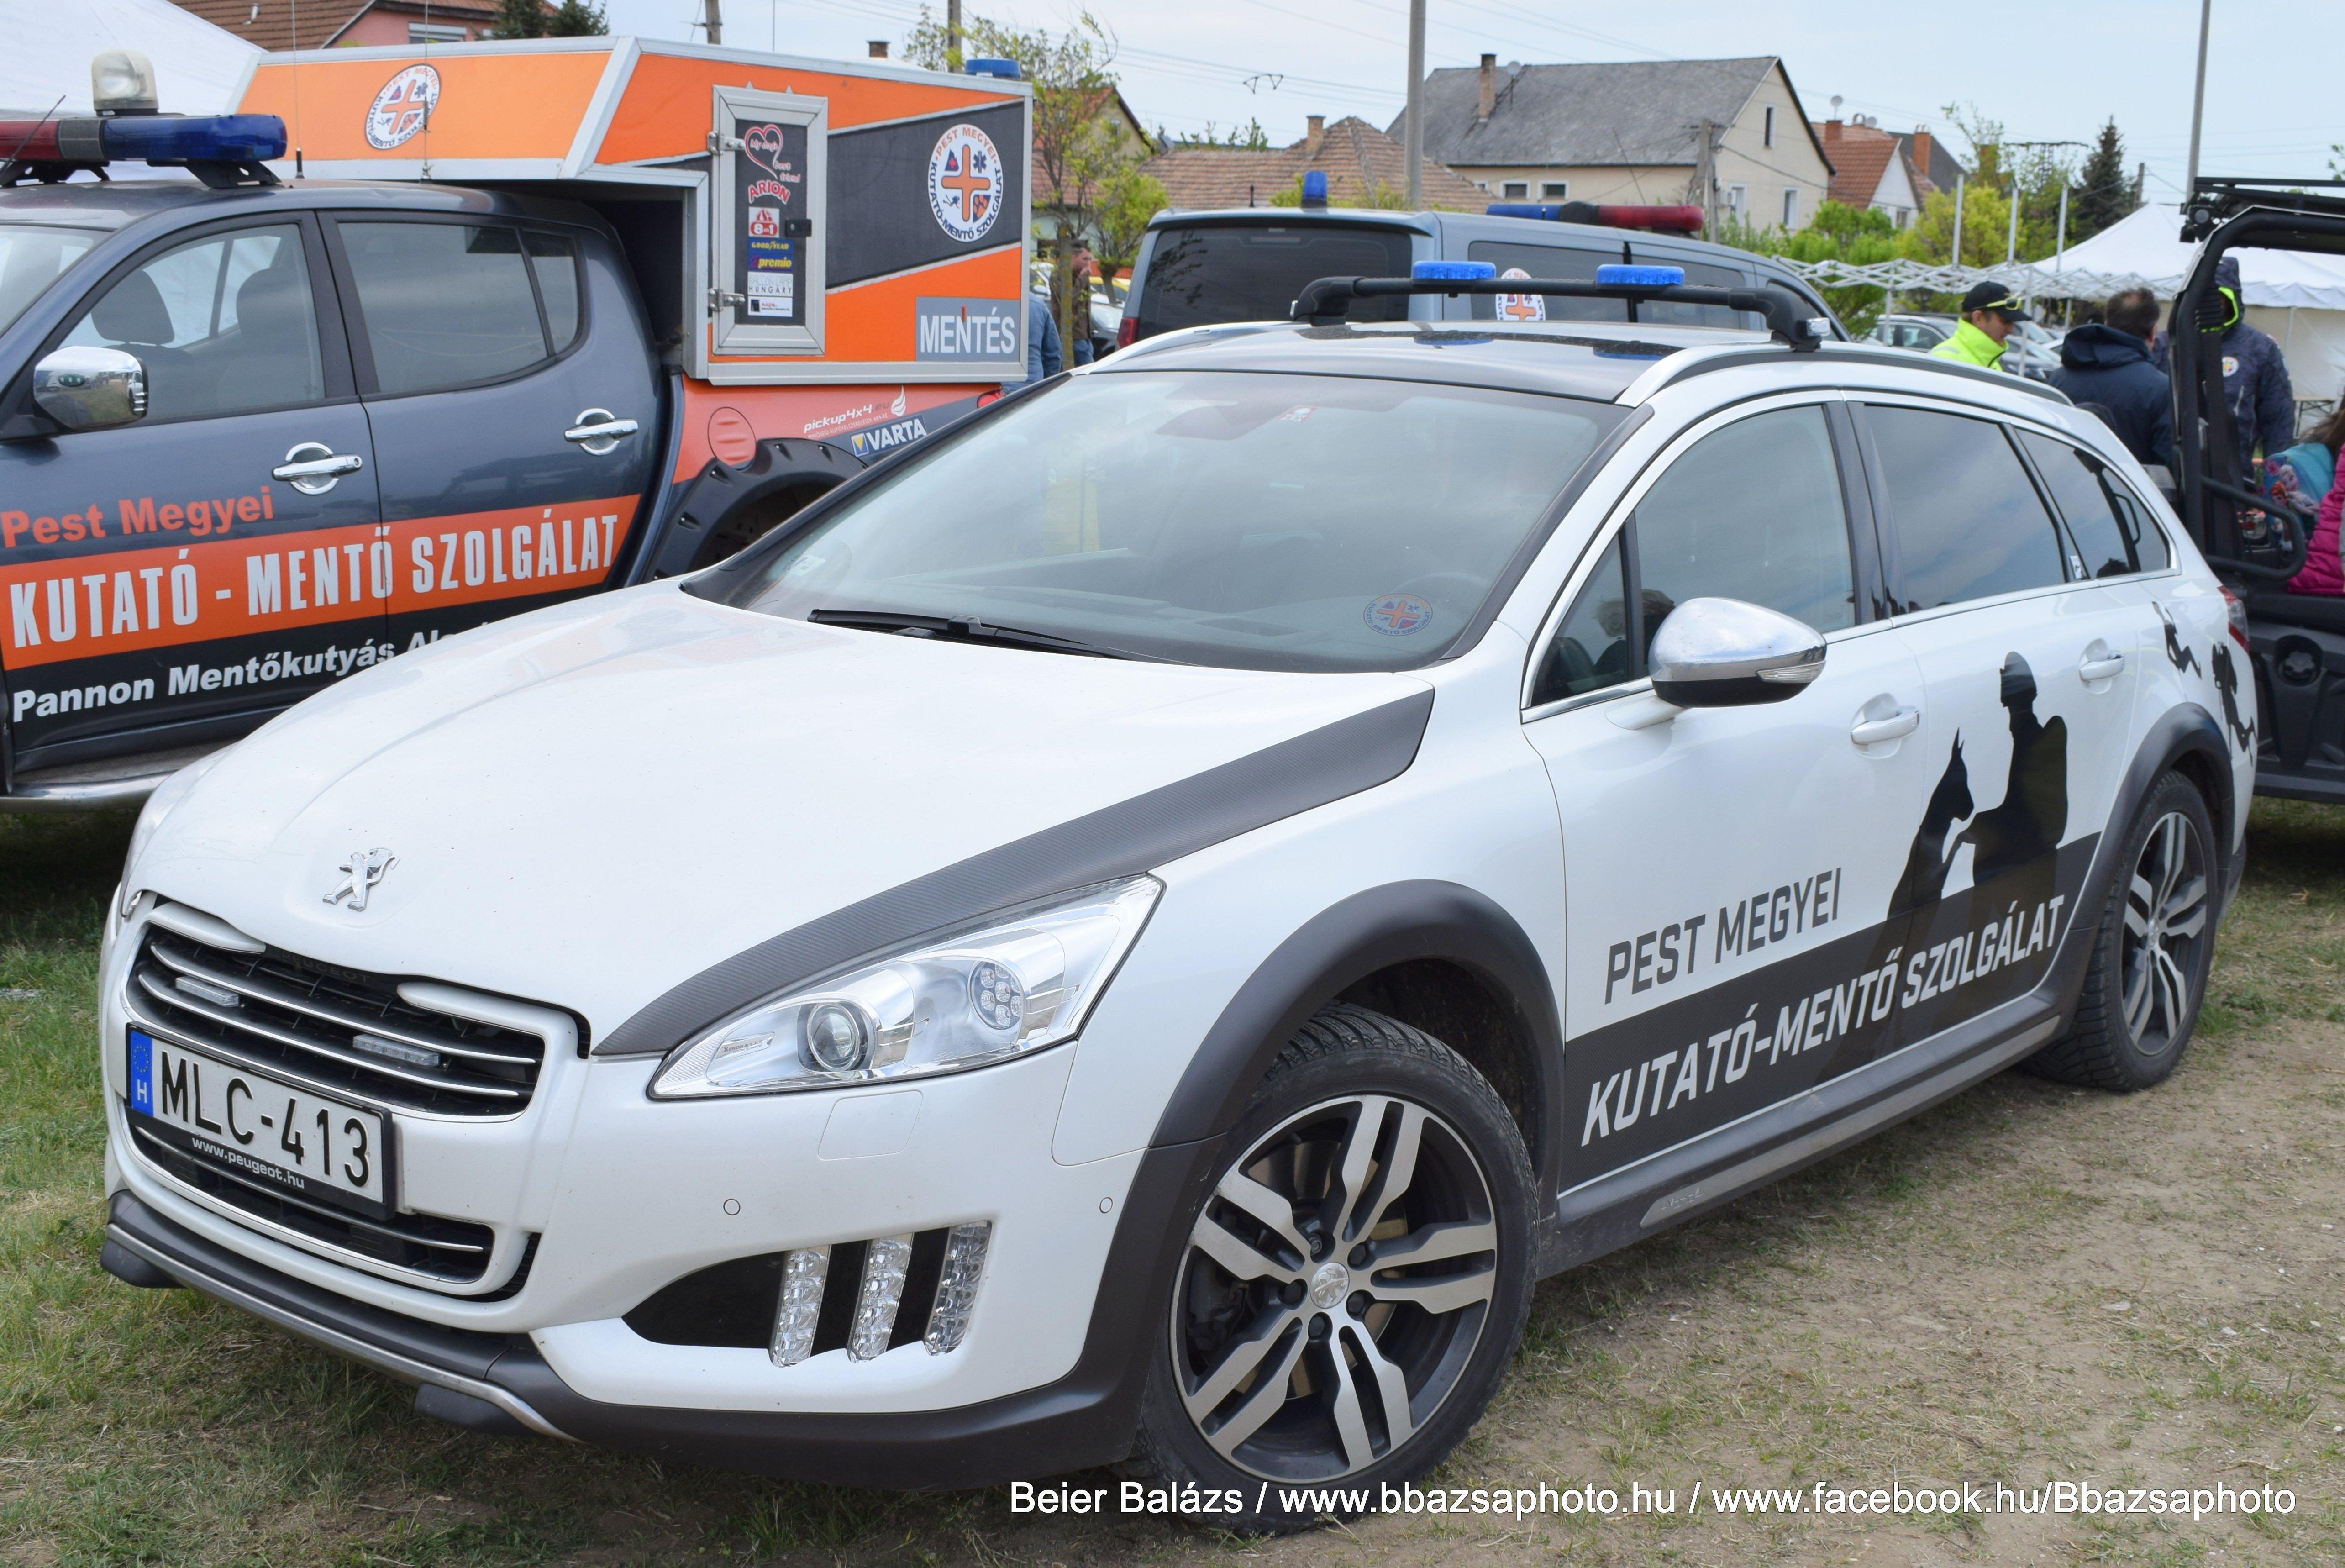 Peugeot 508 RXH – Pest megyei kutató